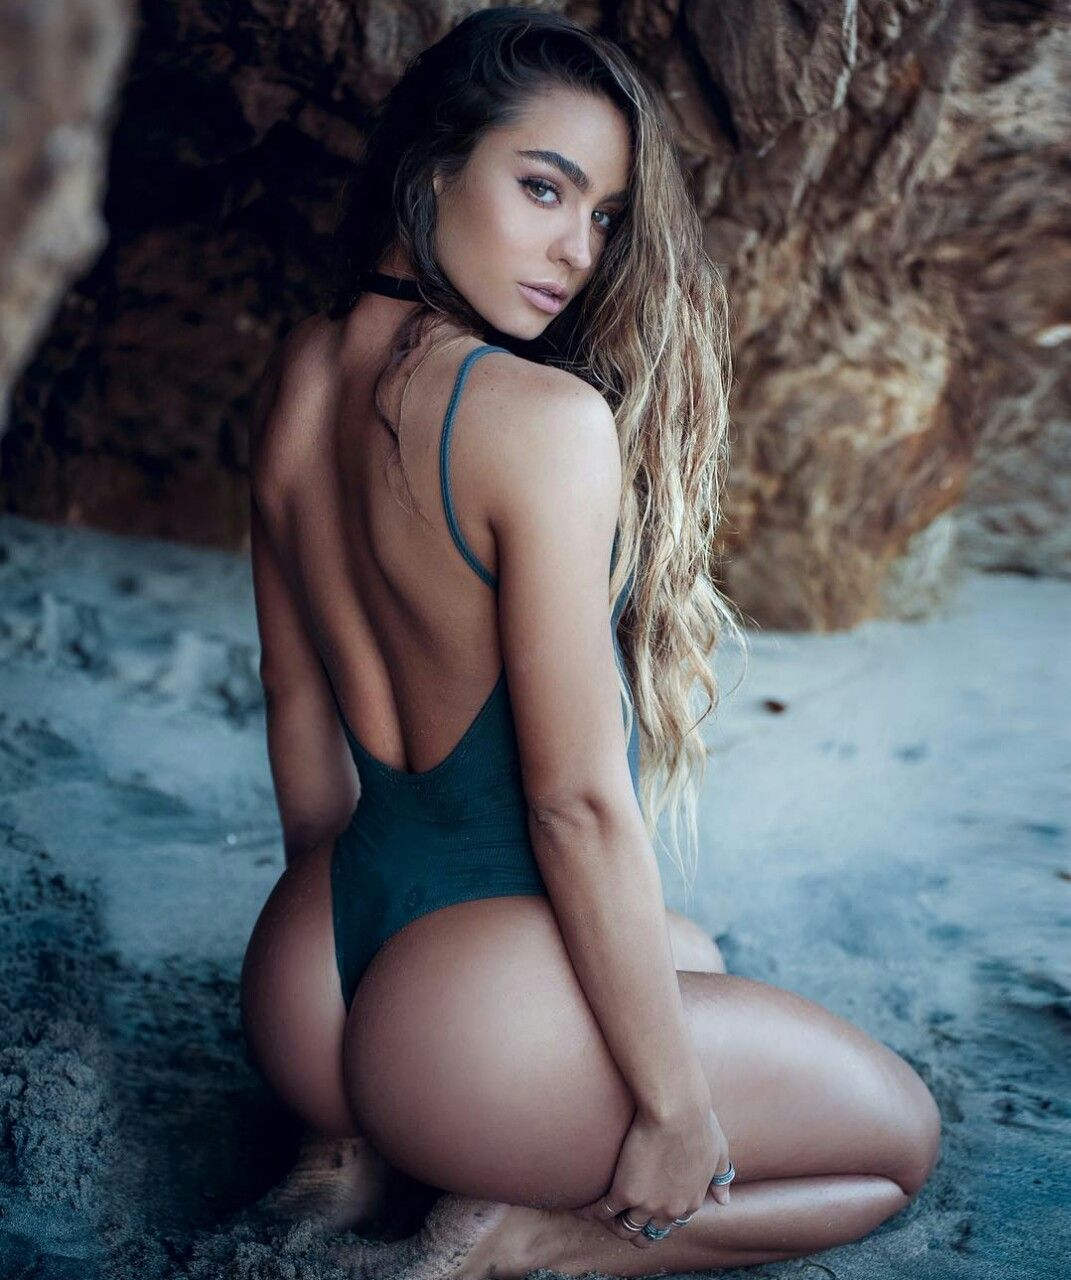 Paparazzi Badd Angel nude (41 photo), Topless, Cleavage, Instagram, underwear 2019